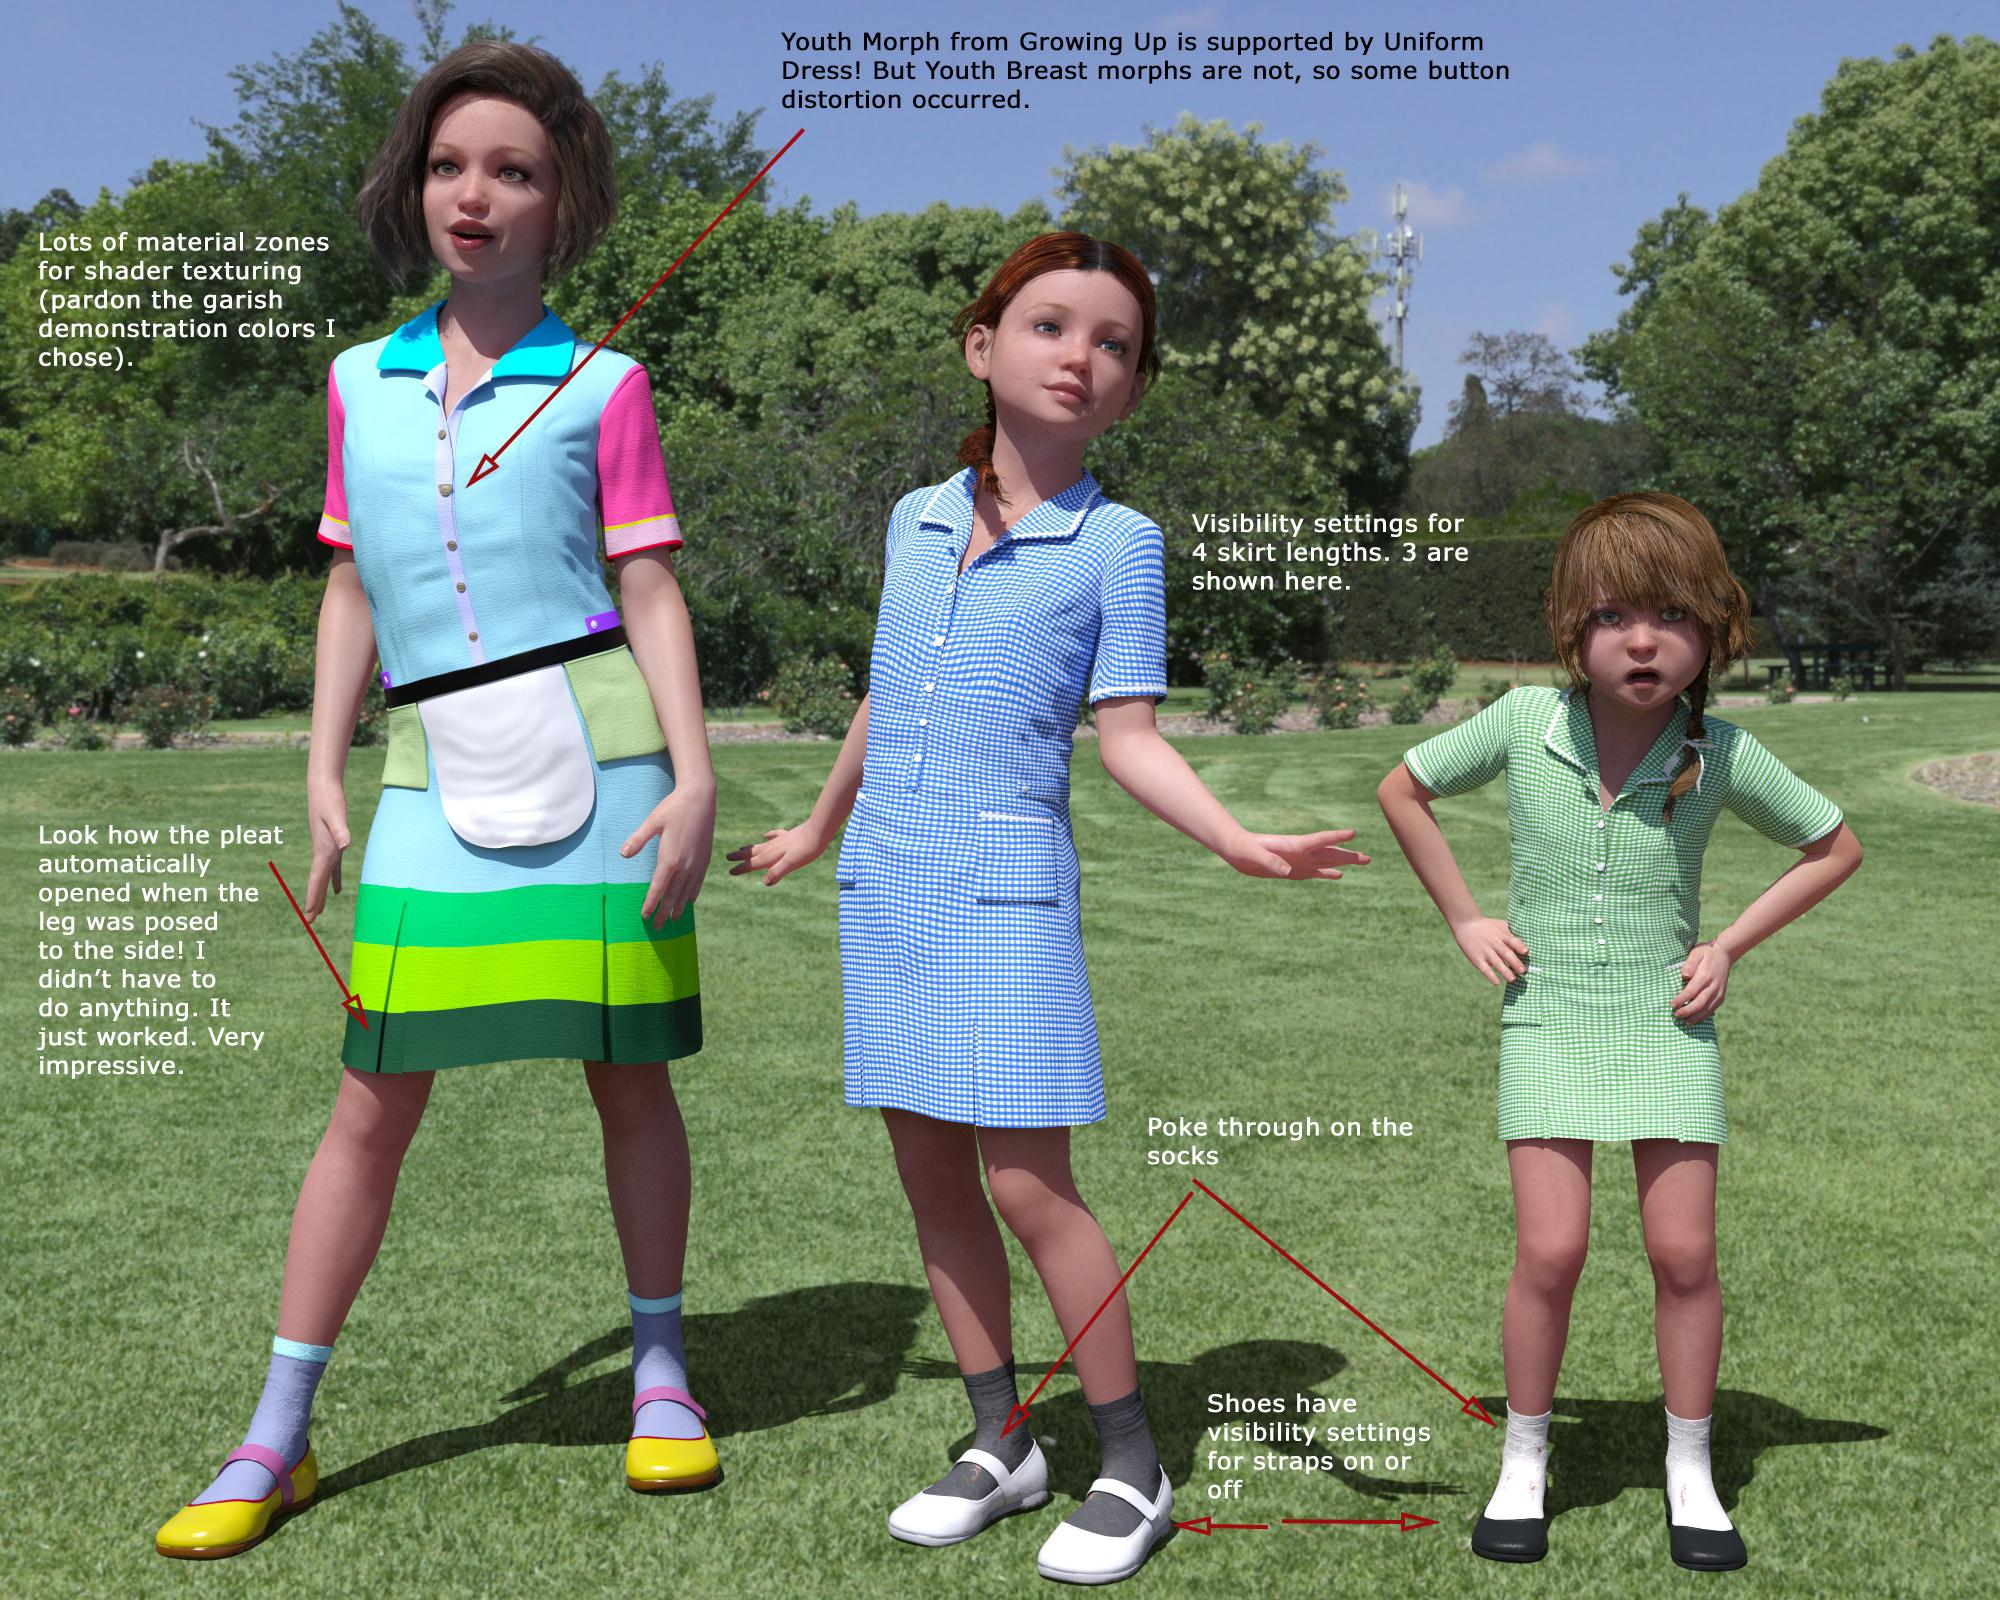 Uniform Dress Growing Up